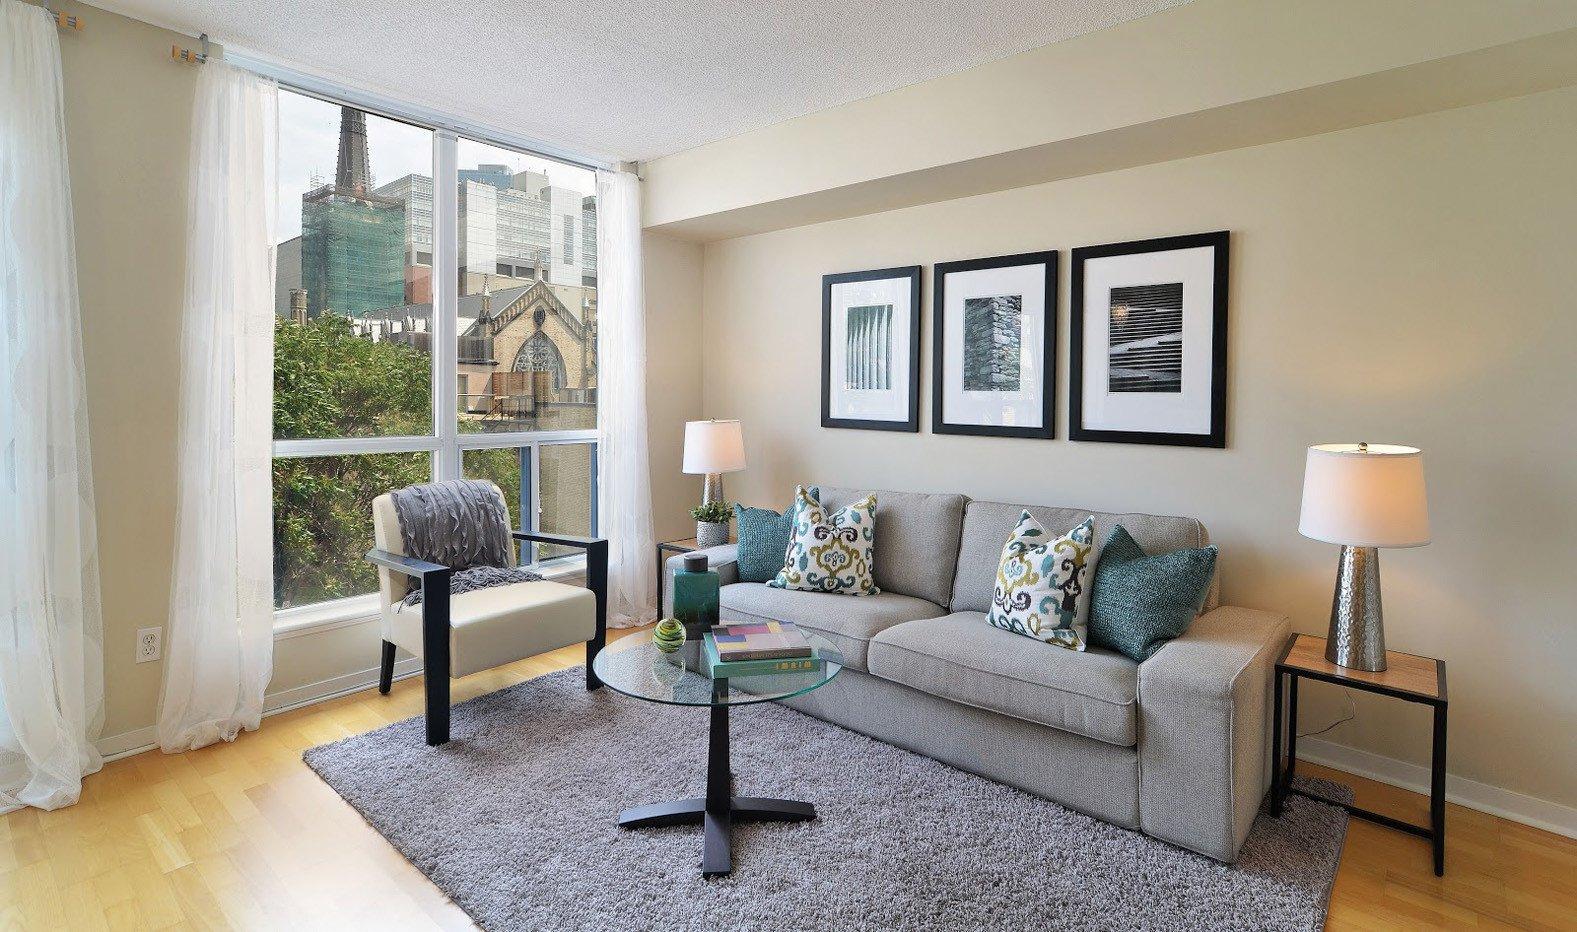 Small Living Room Interior Design 33 Modern Condo Interior Design Ideas